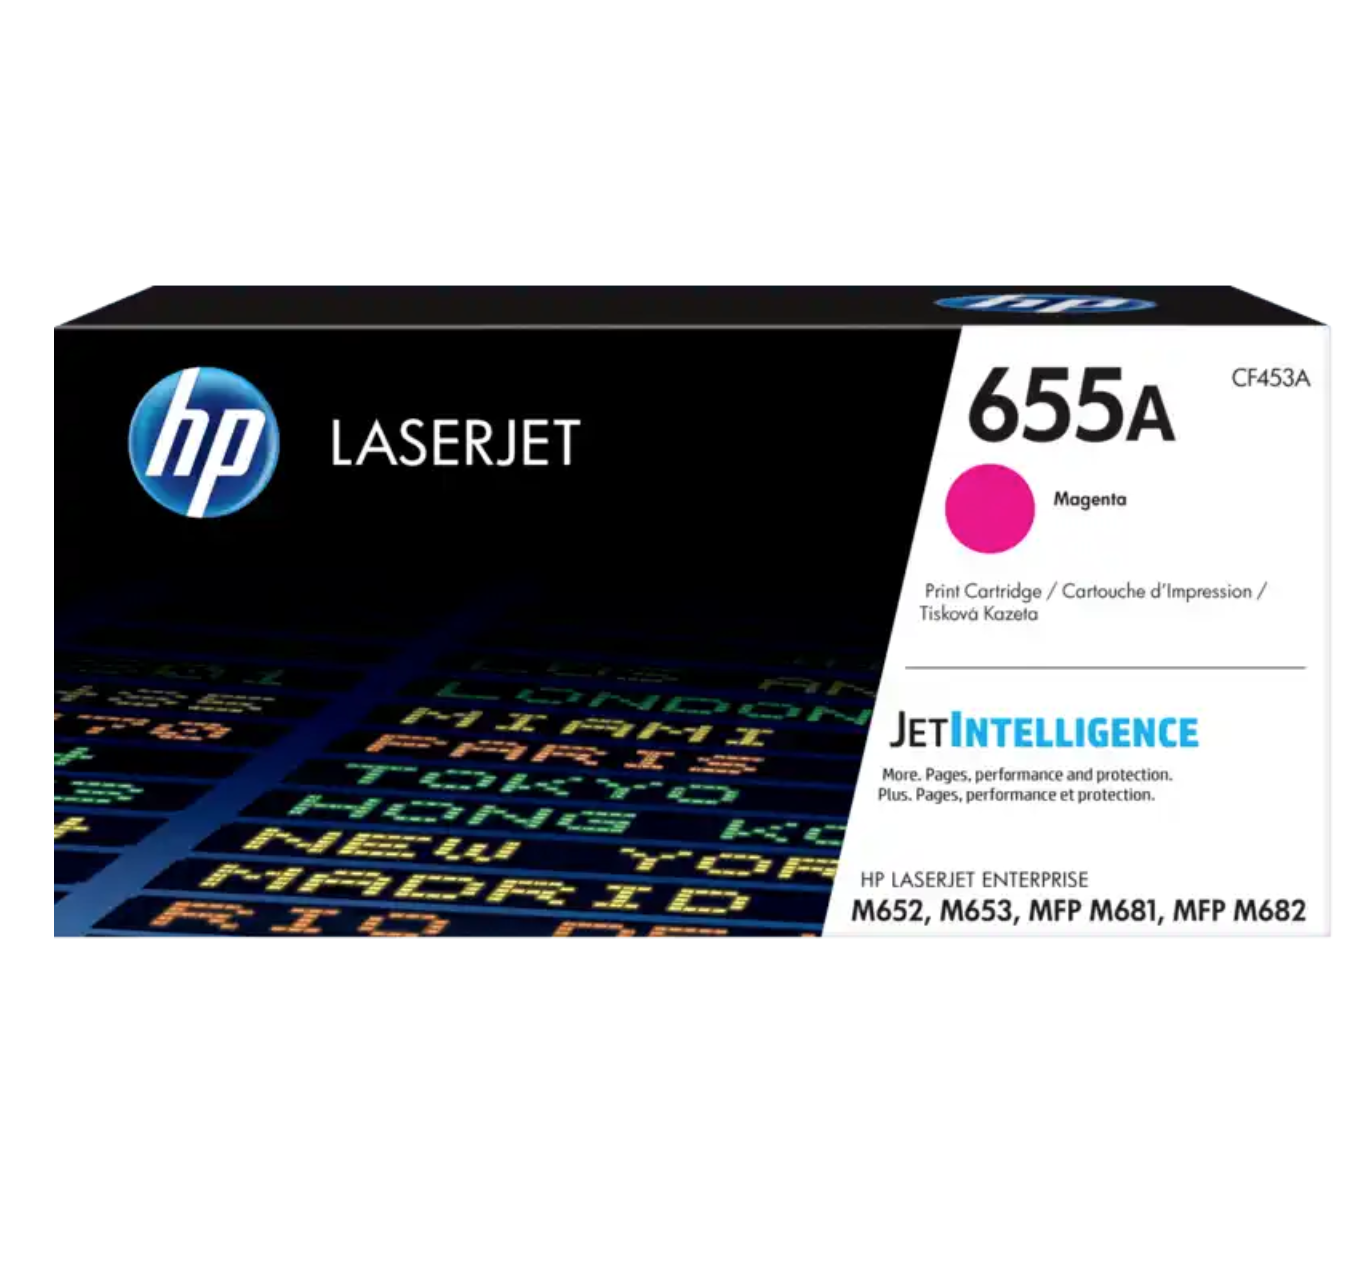 HP 655A 洋紅原廠 LaserJet 碳粉 CF453A